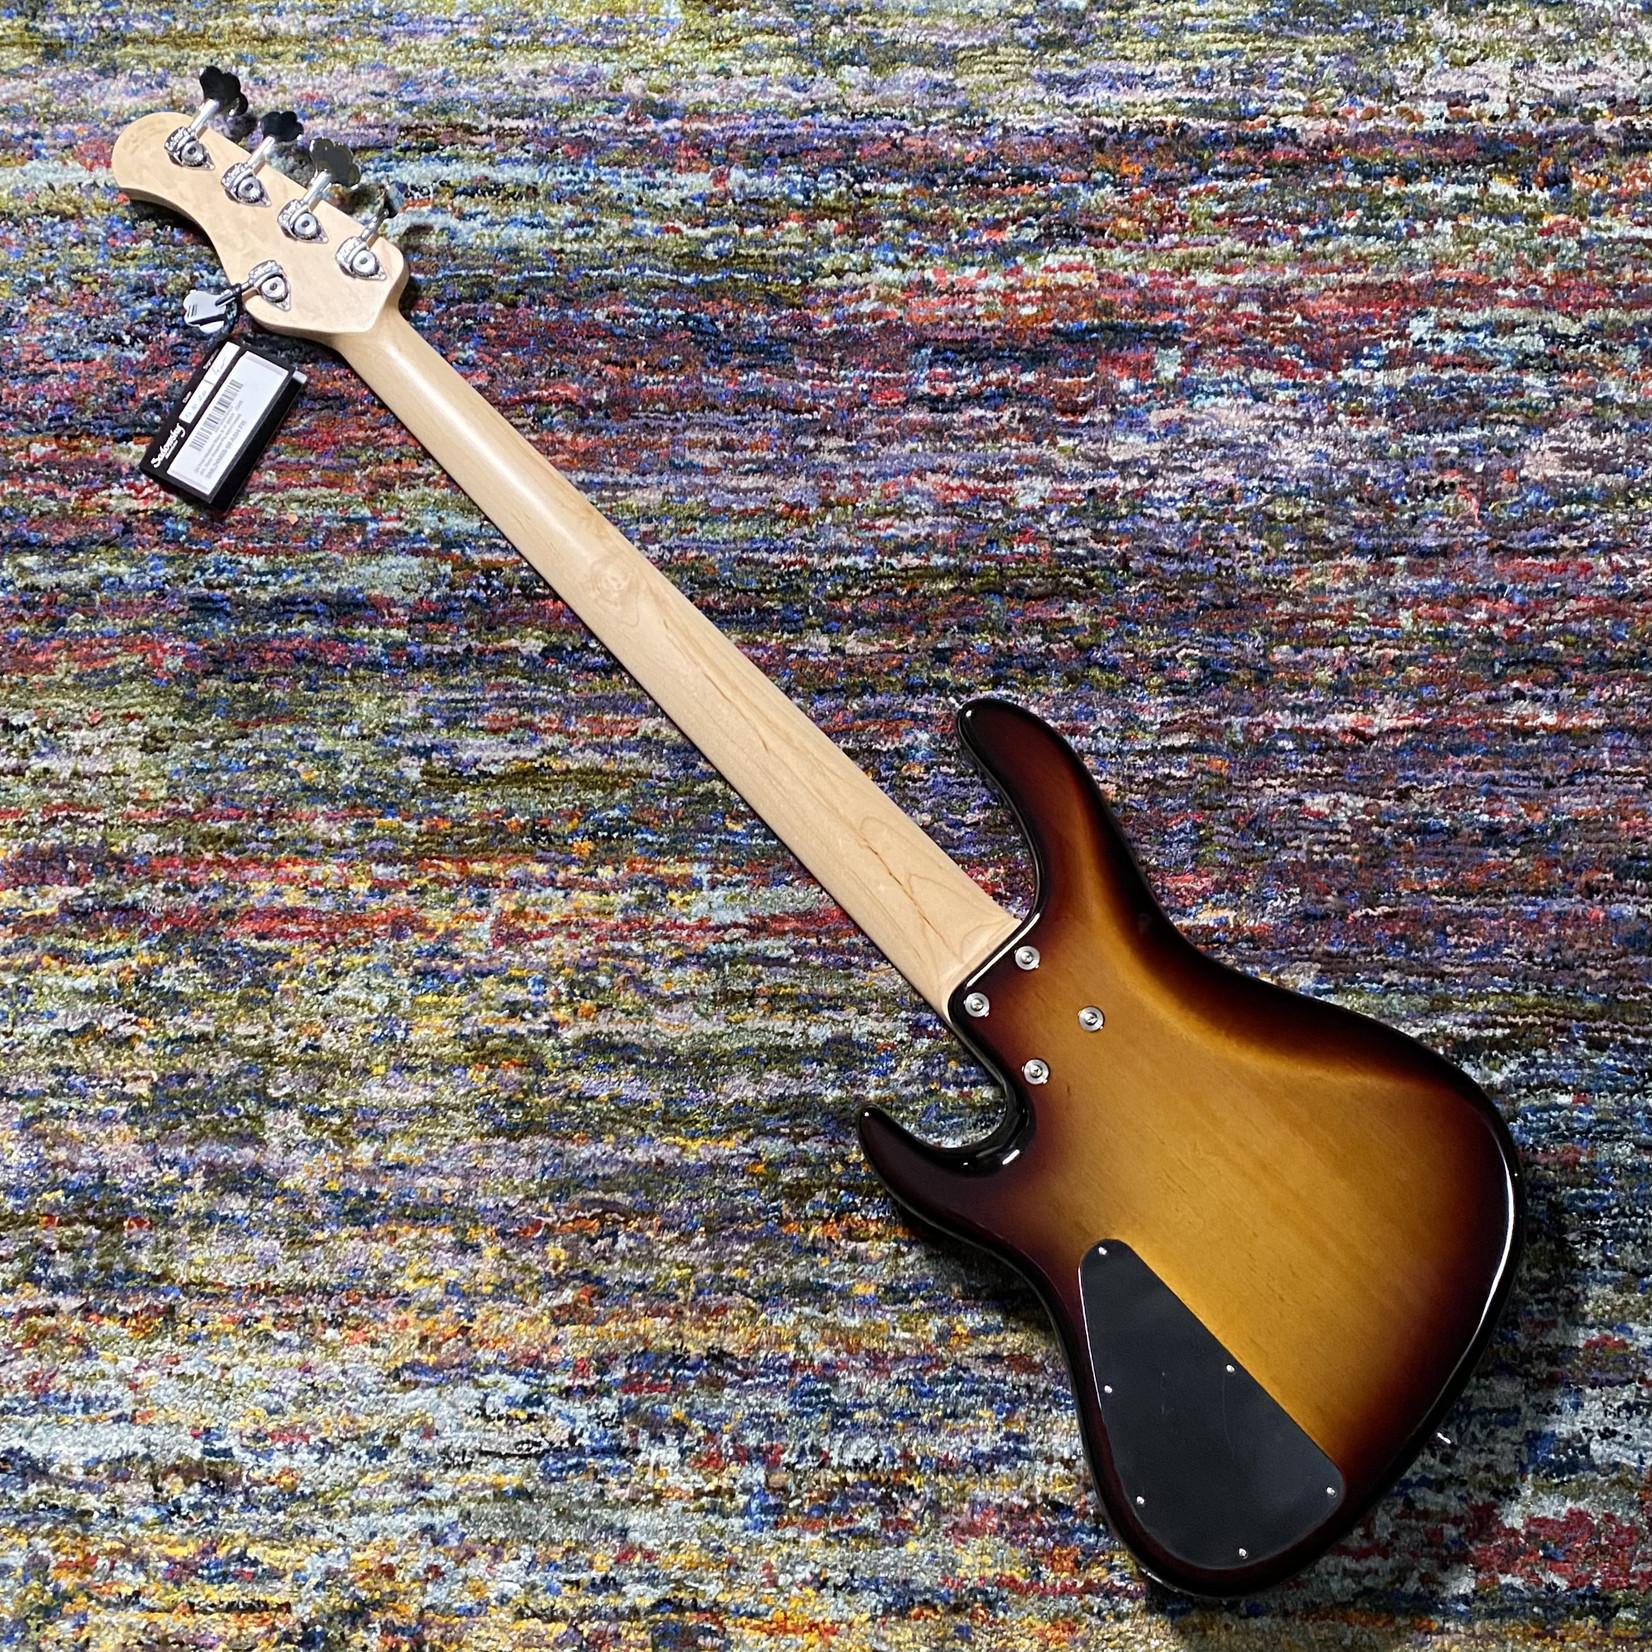 Sadowsky Sadowsky MetroLine 24-Fret Modern 5-String Bass, Swamp Ash, '59 Burst Transp., Made in Germany, 2020